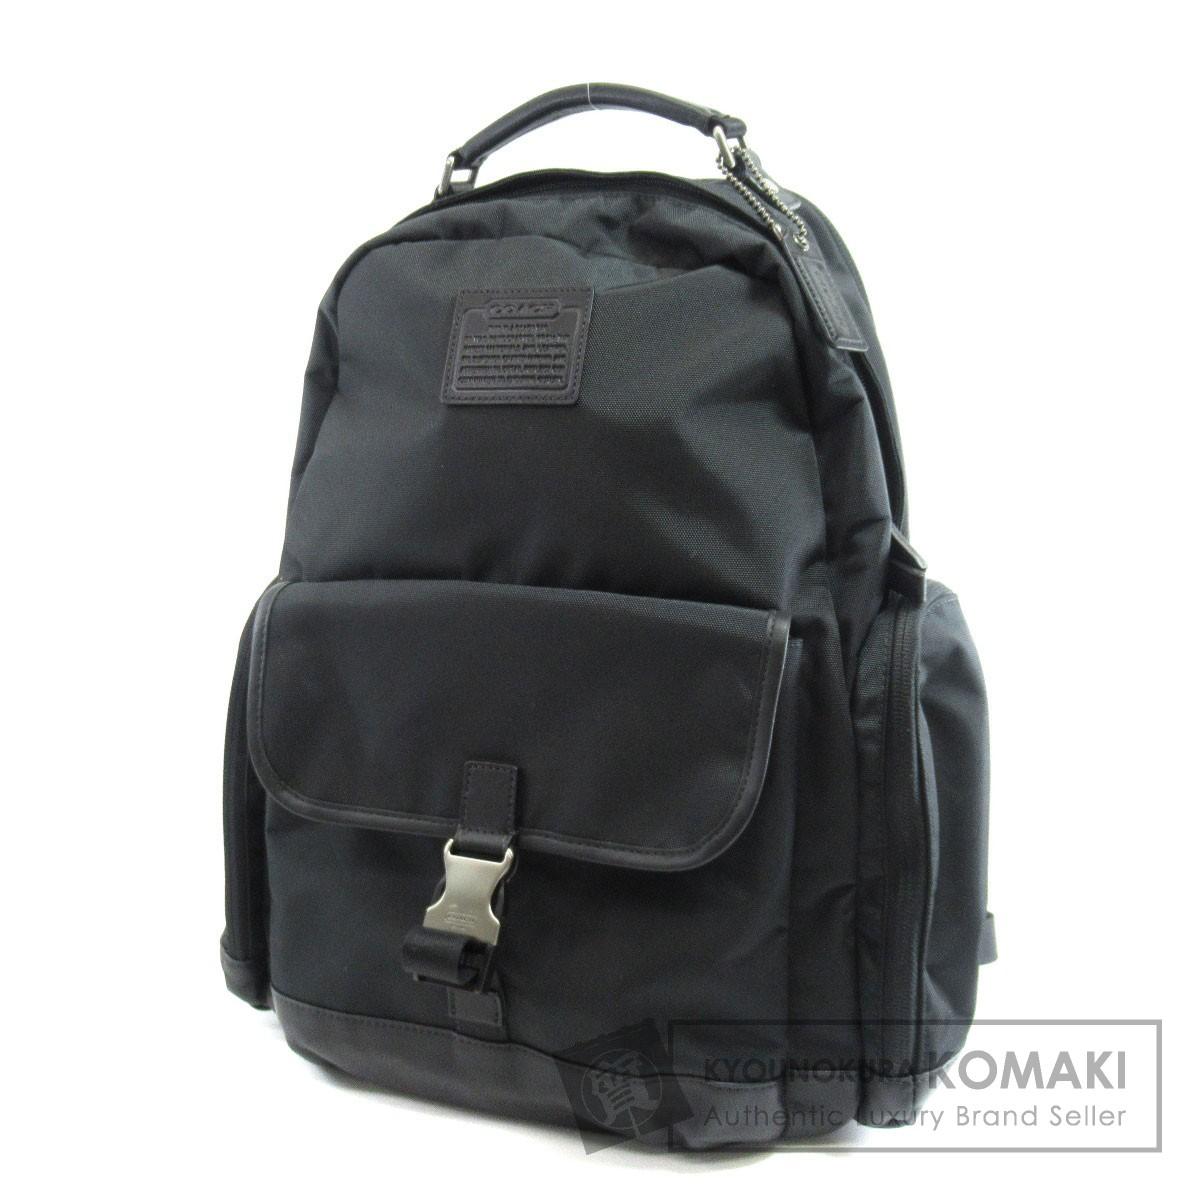 COACH F70574 ロゴマーク リュック・デイパック ナイロン素材 メンズ 【中古】【コーチ】